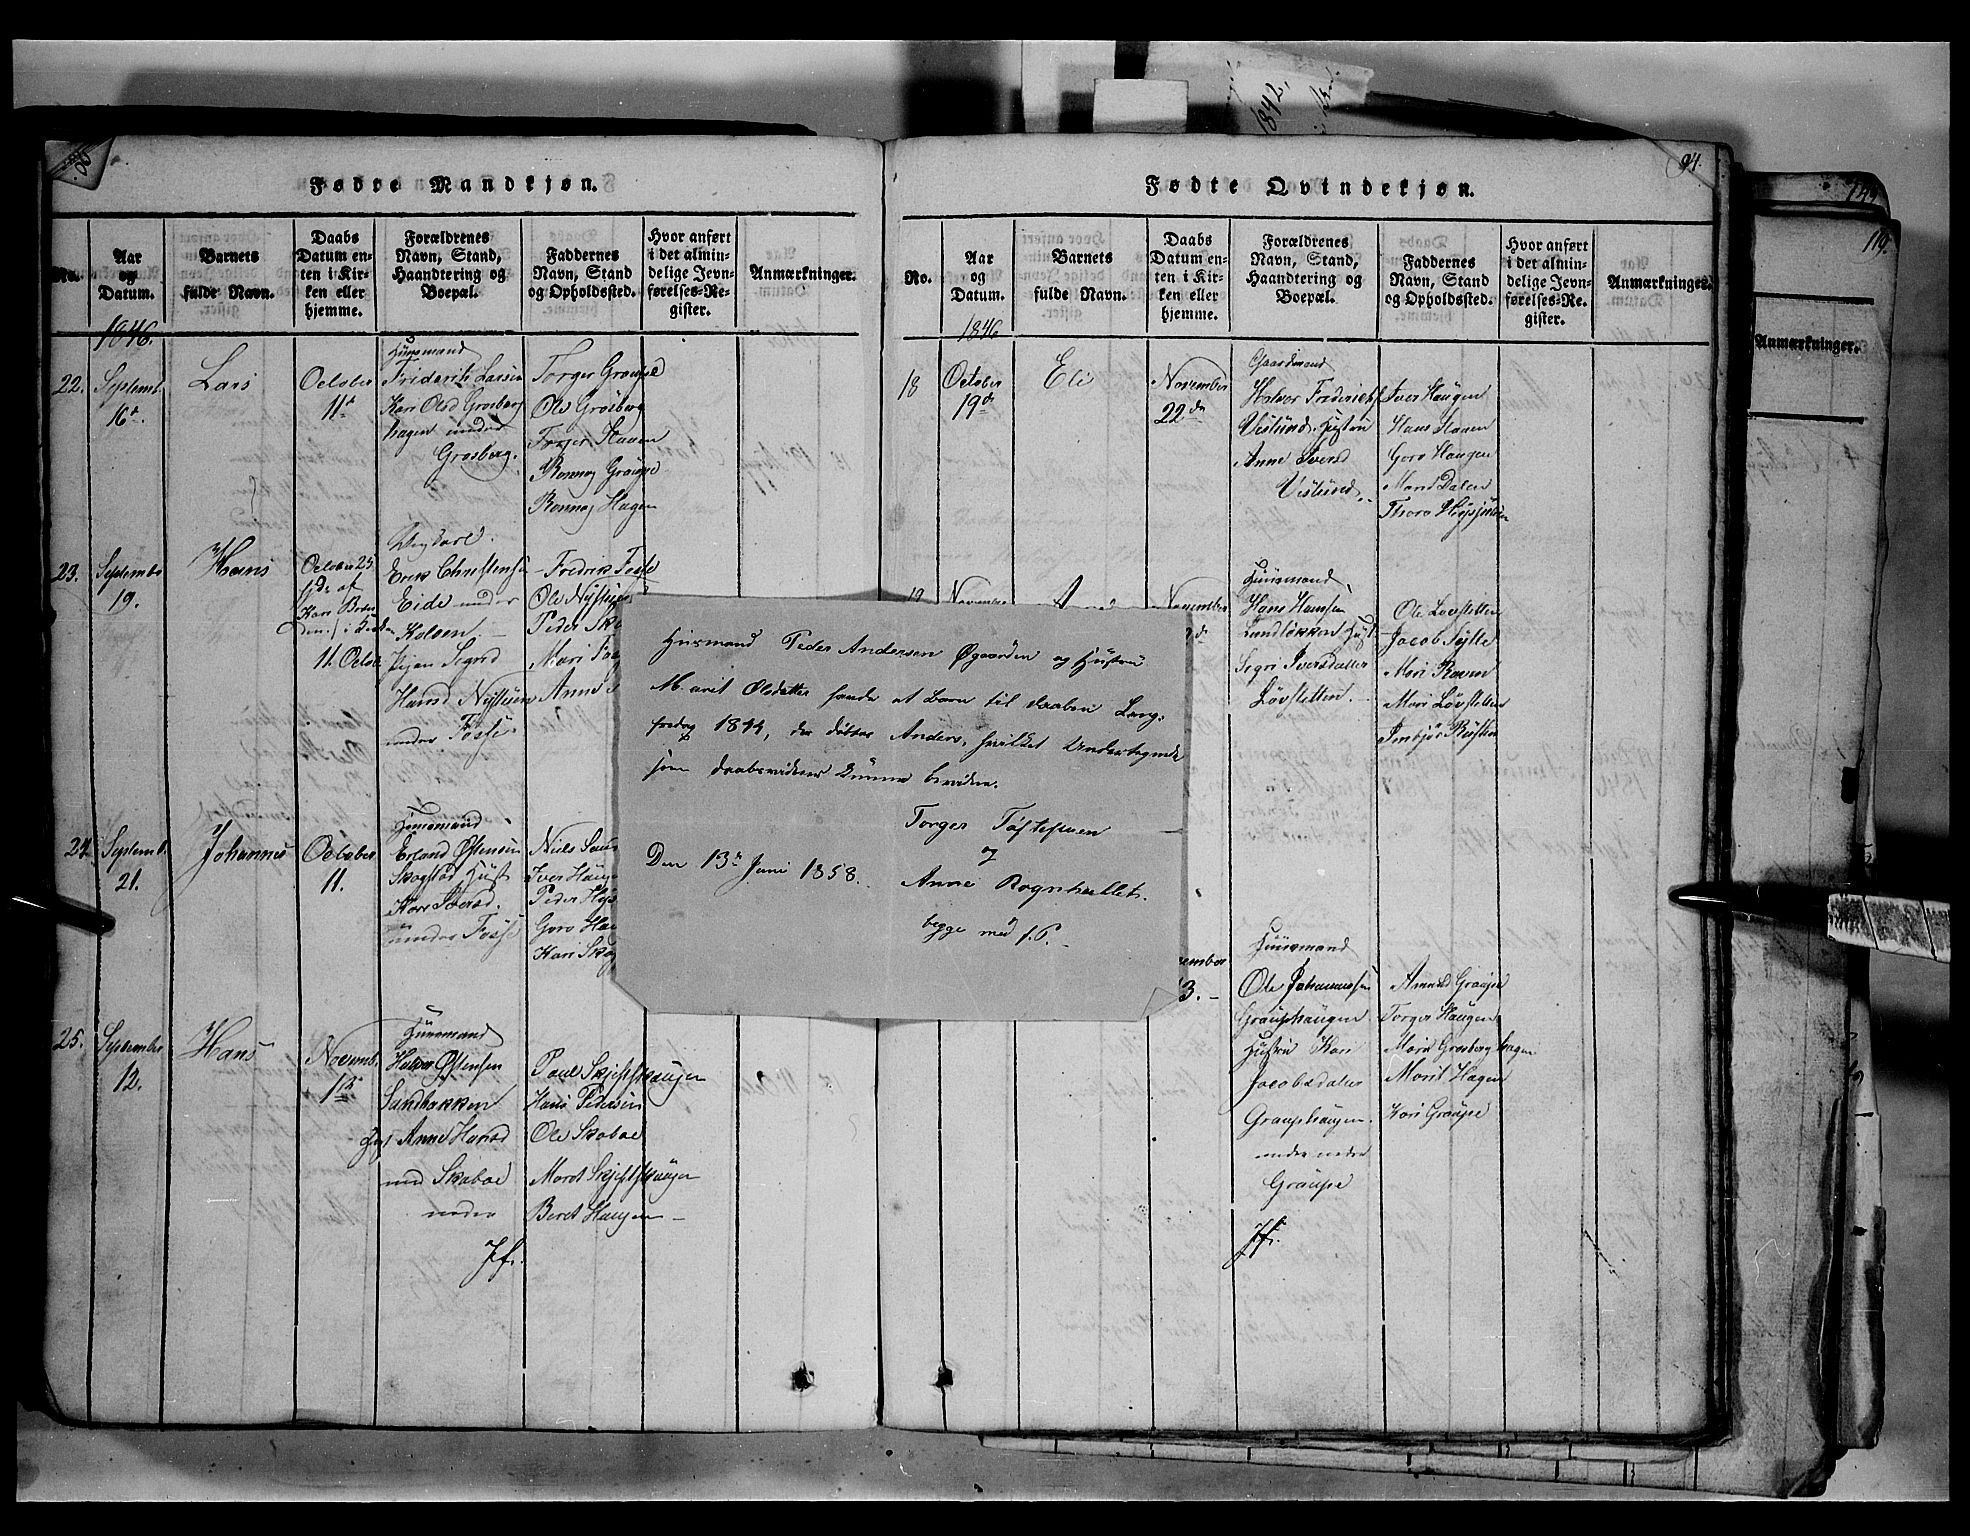 SAH, Fron prestekontor, H/Ha/Hab/L0003: Klokkerbok nr. 3, 1816-1850, s. 91